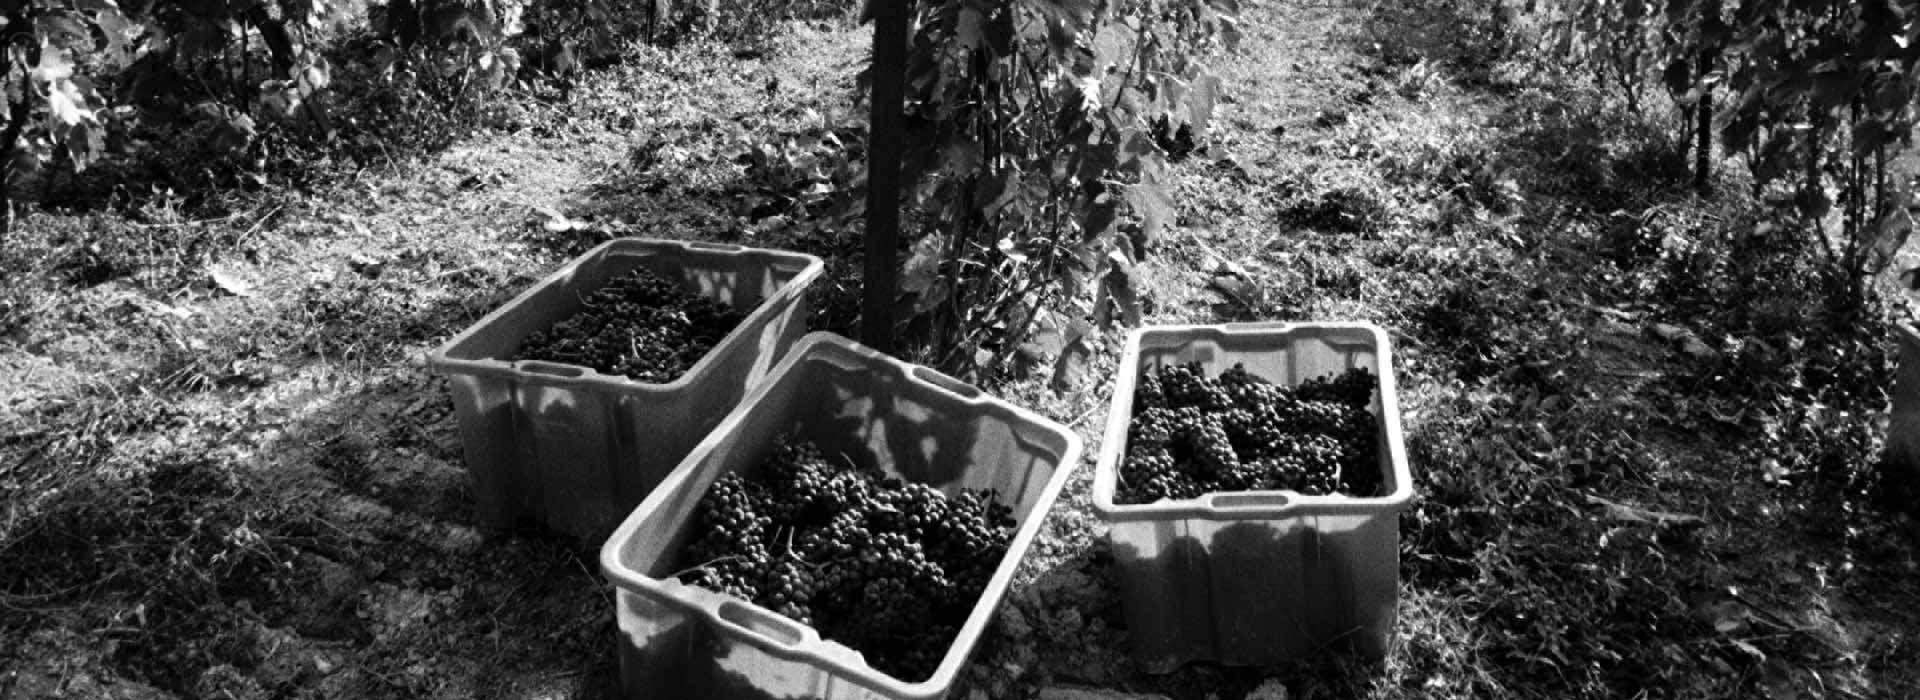 cultivar-valturio-grappoli